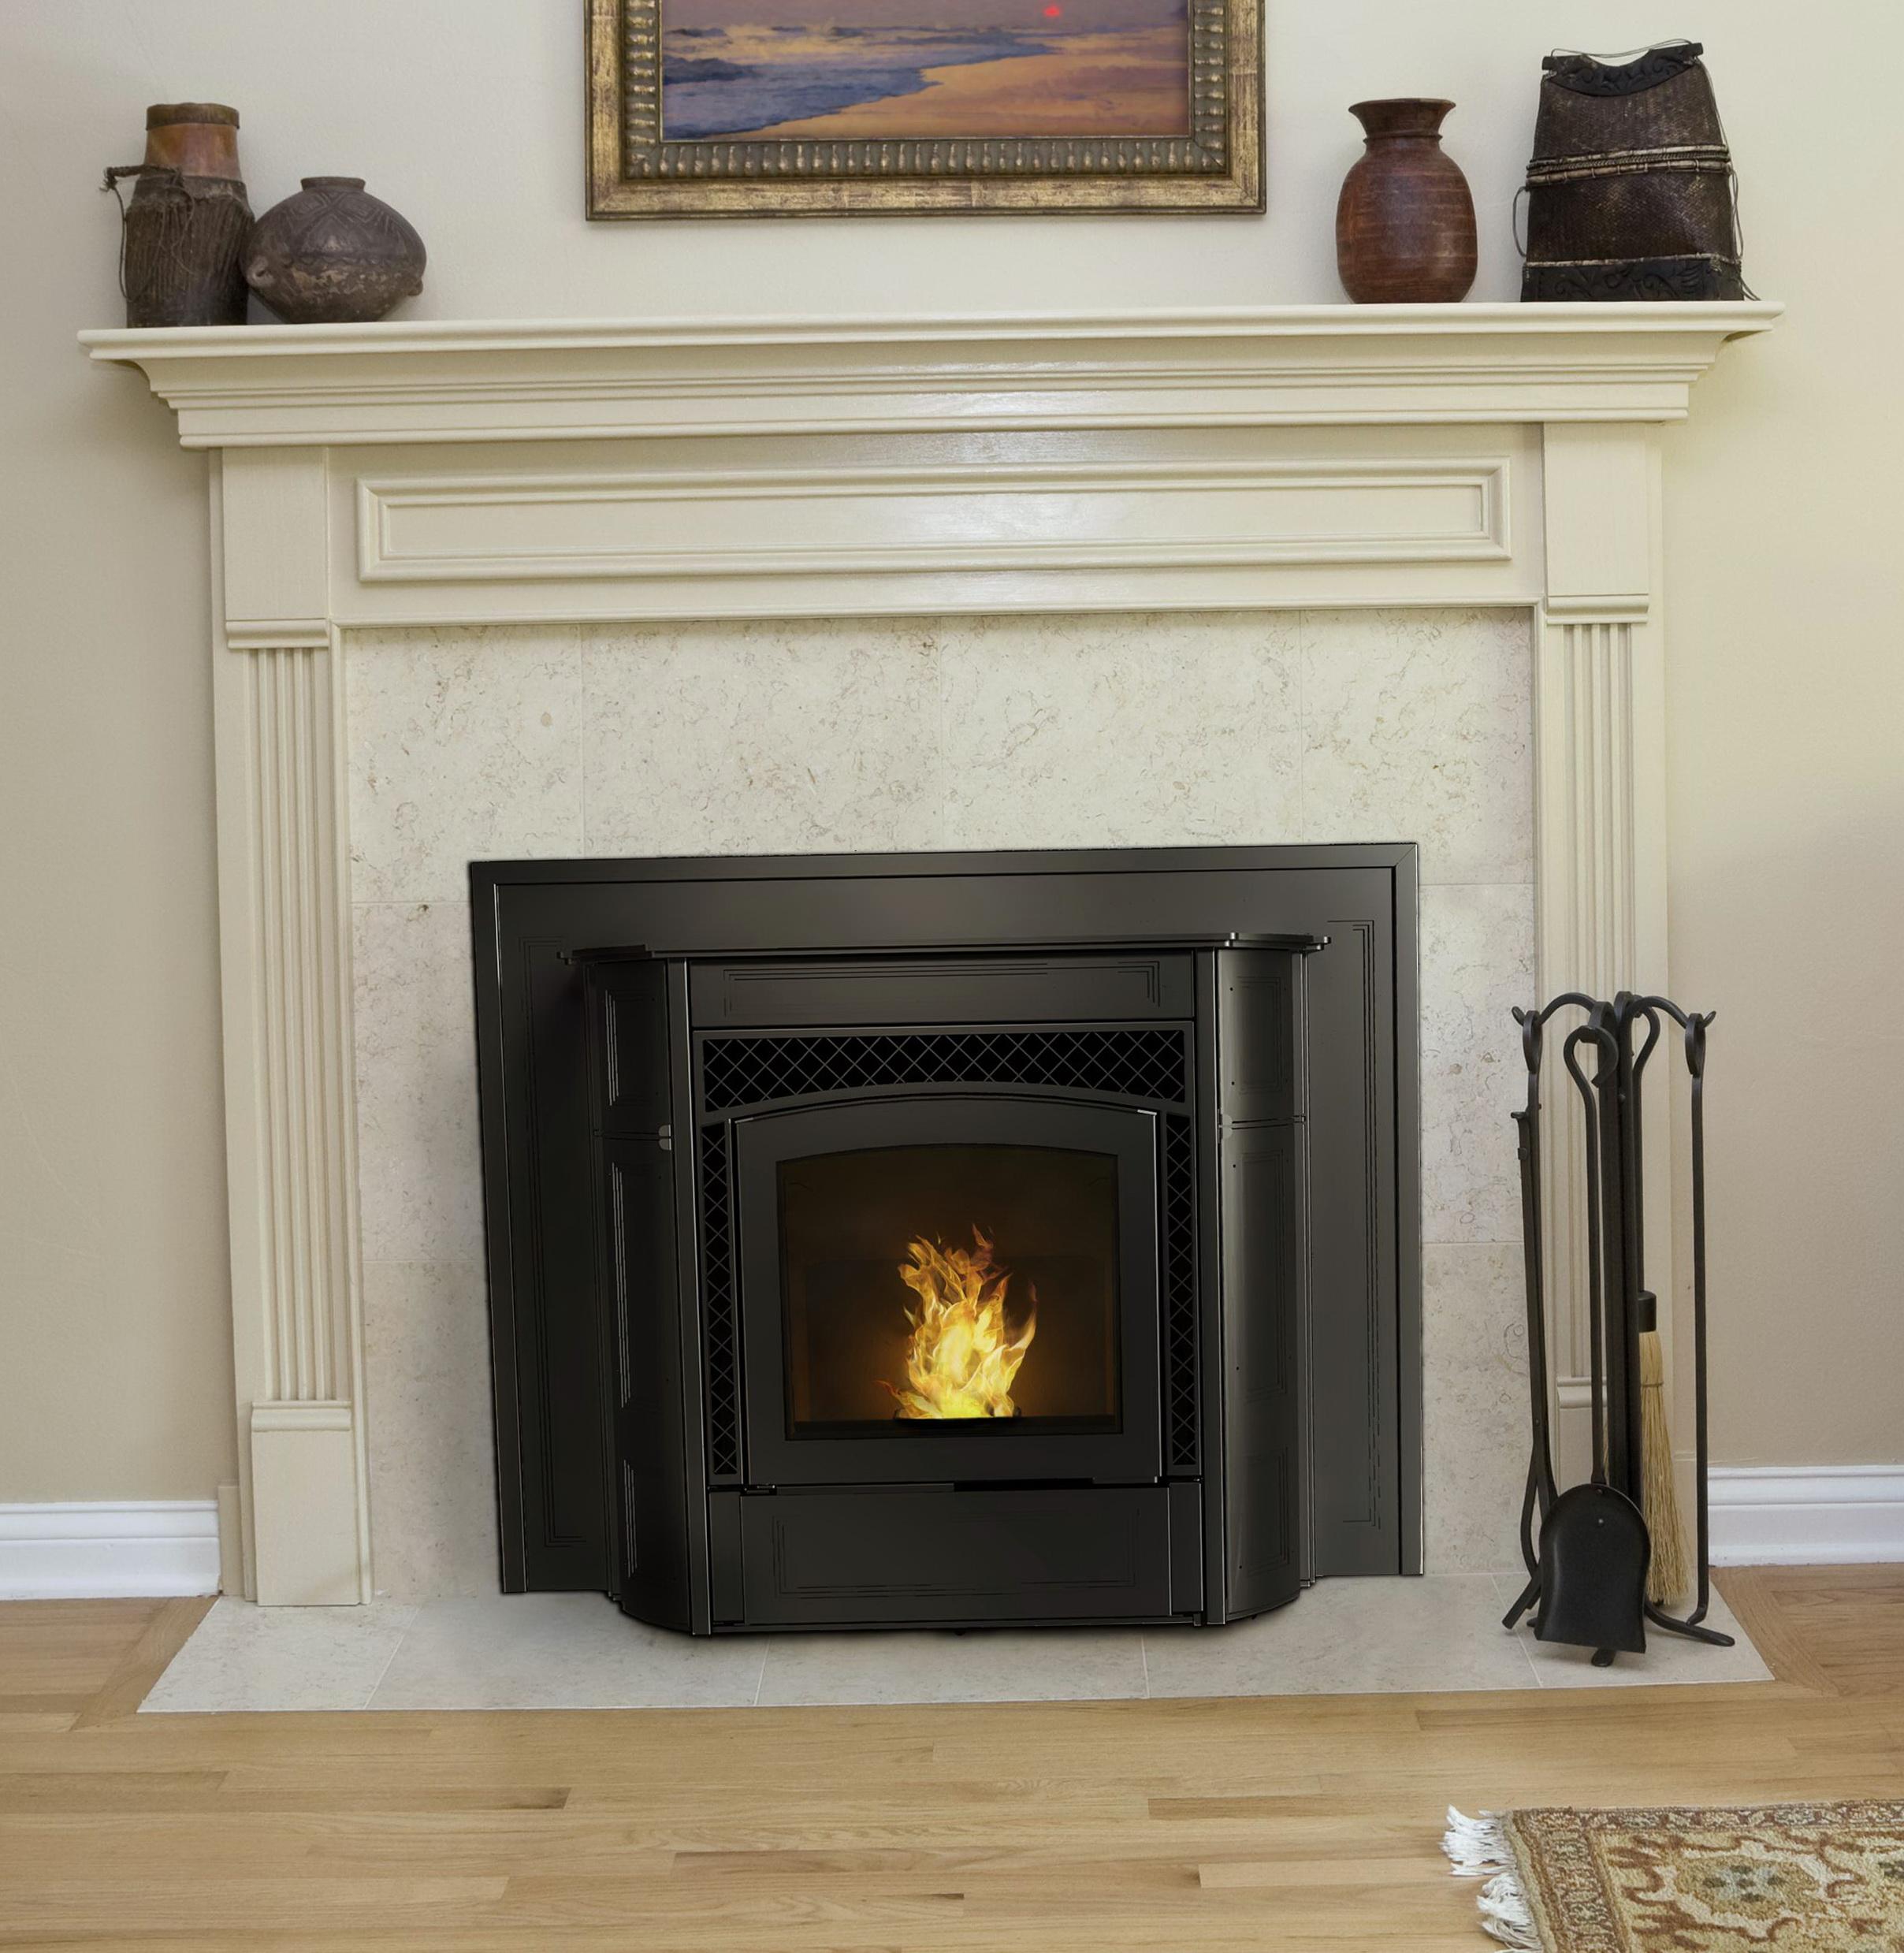 Glacier Bay Wood Stove Fireplace Insert